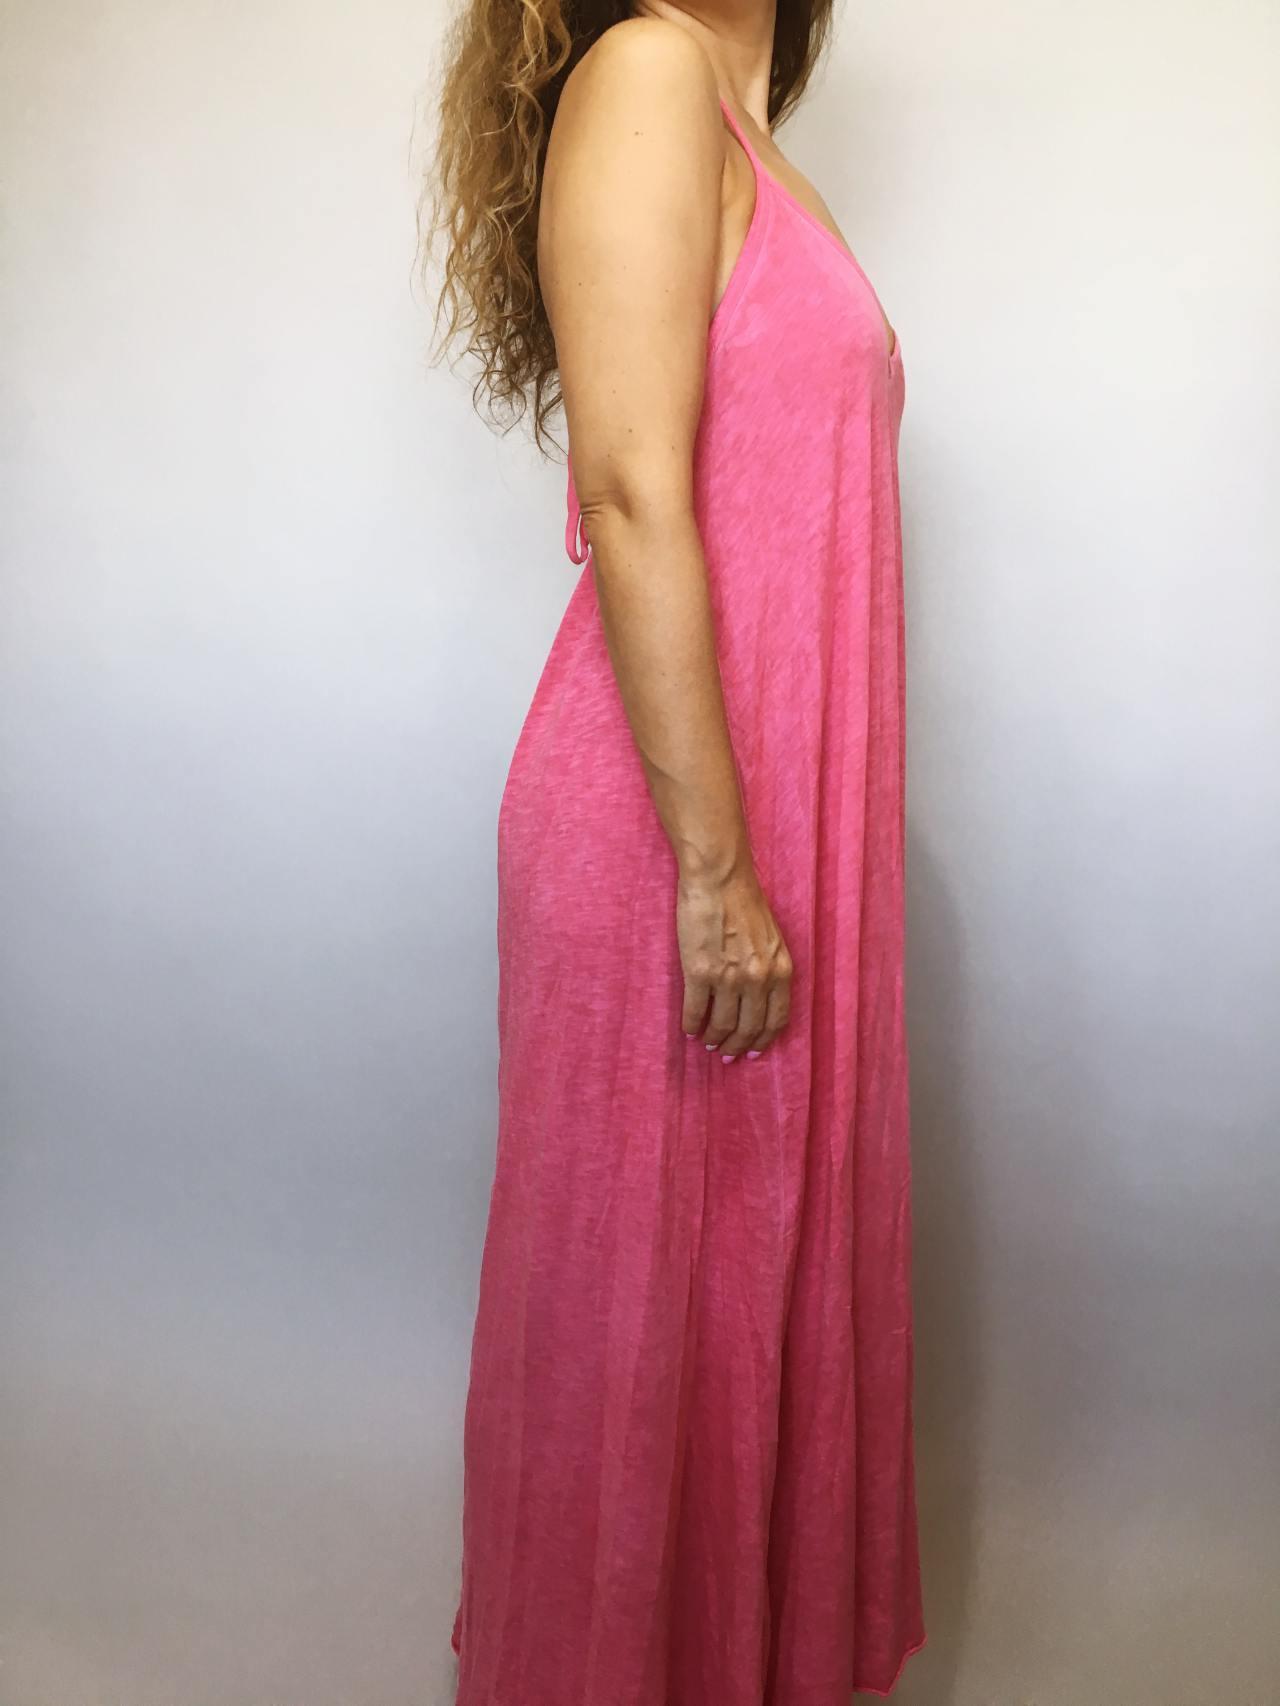 Šaty Sandy růžové 03